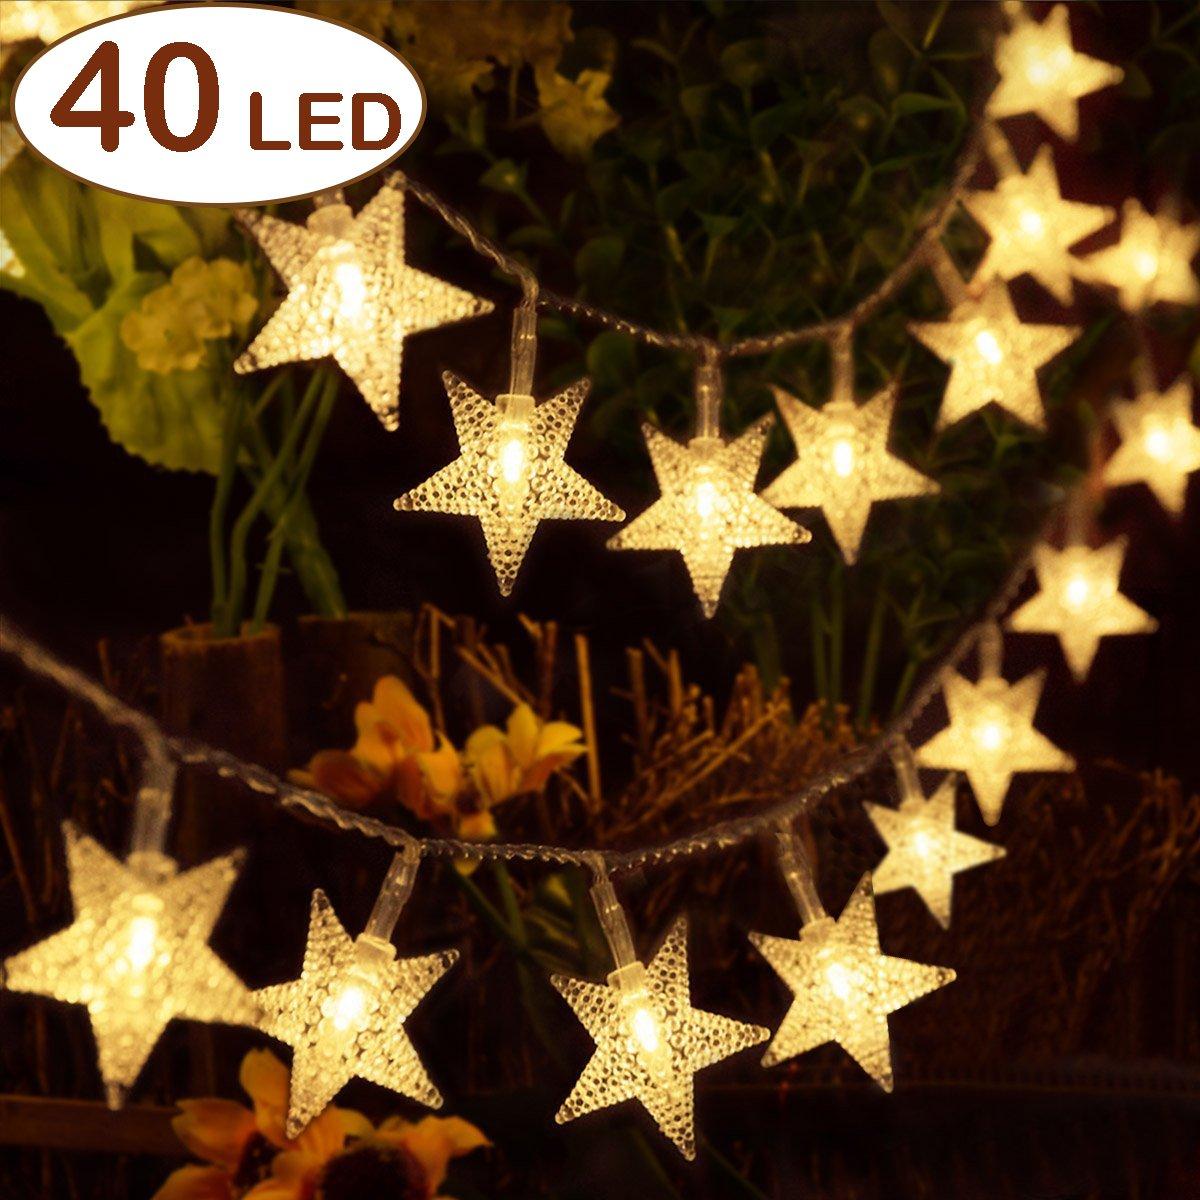 Cookey Luces LED Diseño de Estrellas Estrellas M Baterías Powered Decorativo Blancas